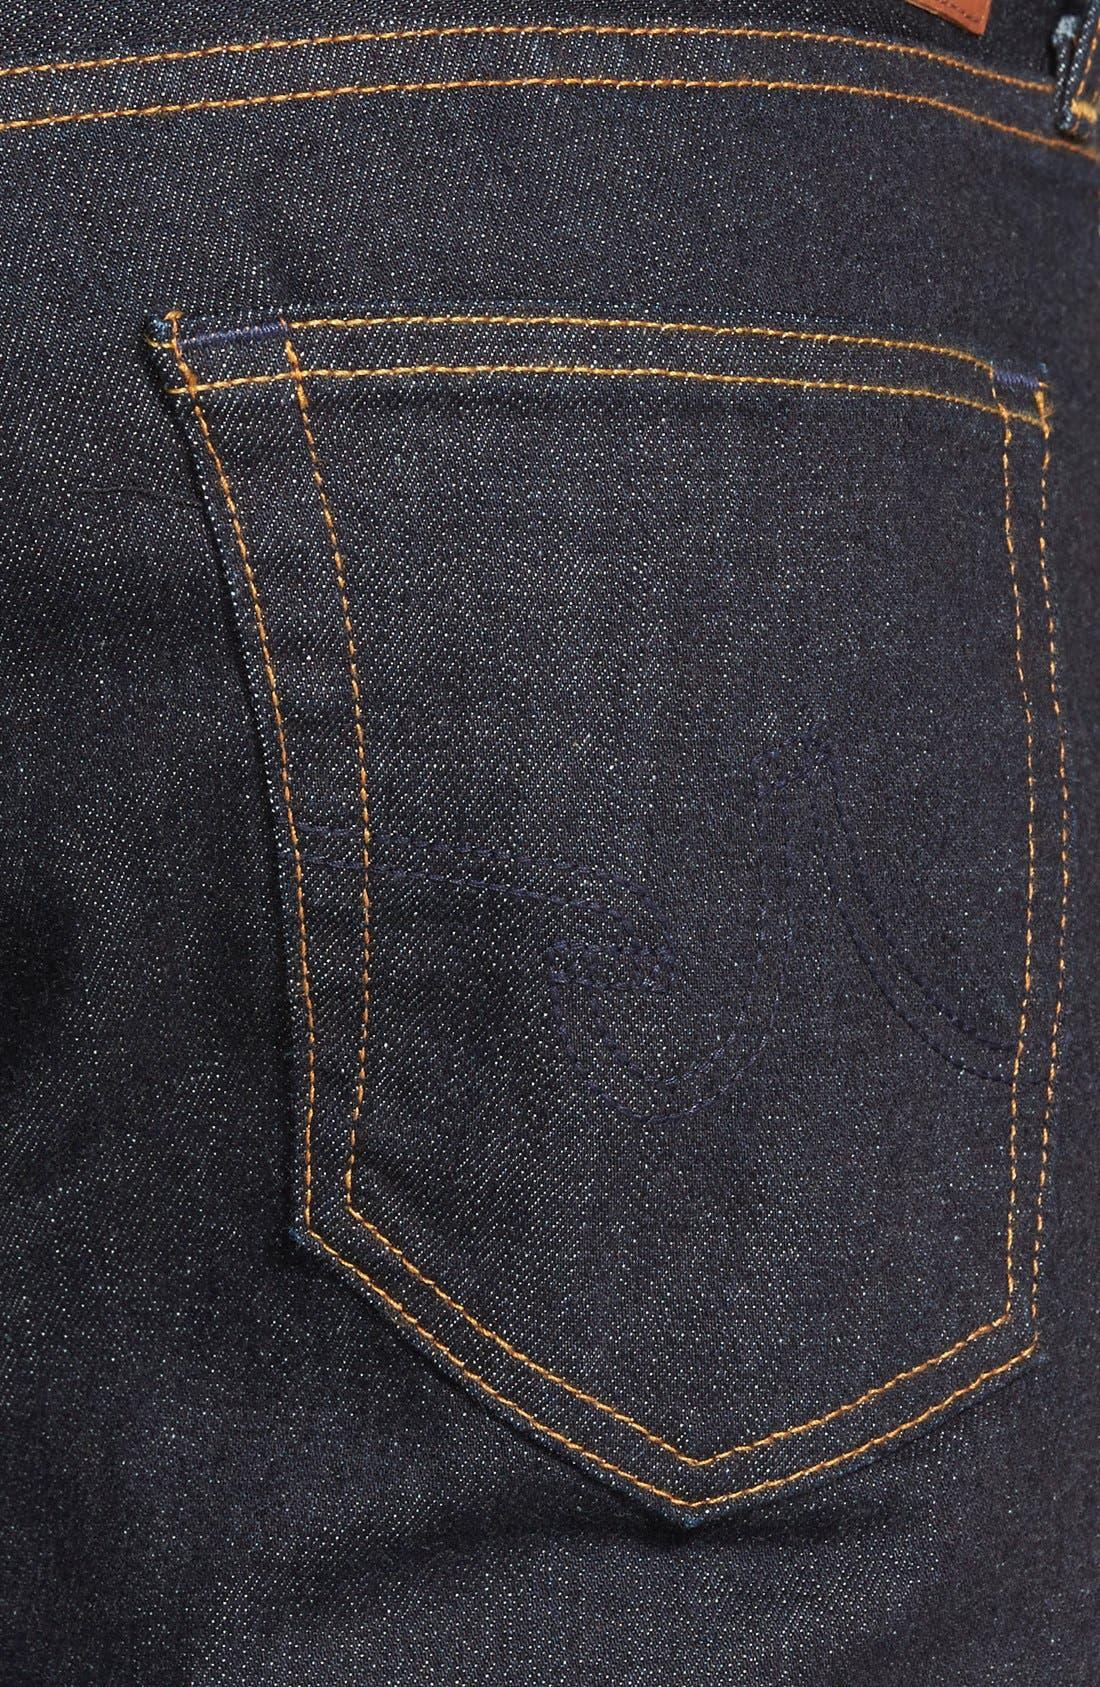 Protégé Straight Leg Jeans,                             Alternate thumbnail 4, color,                             461